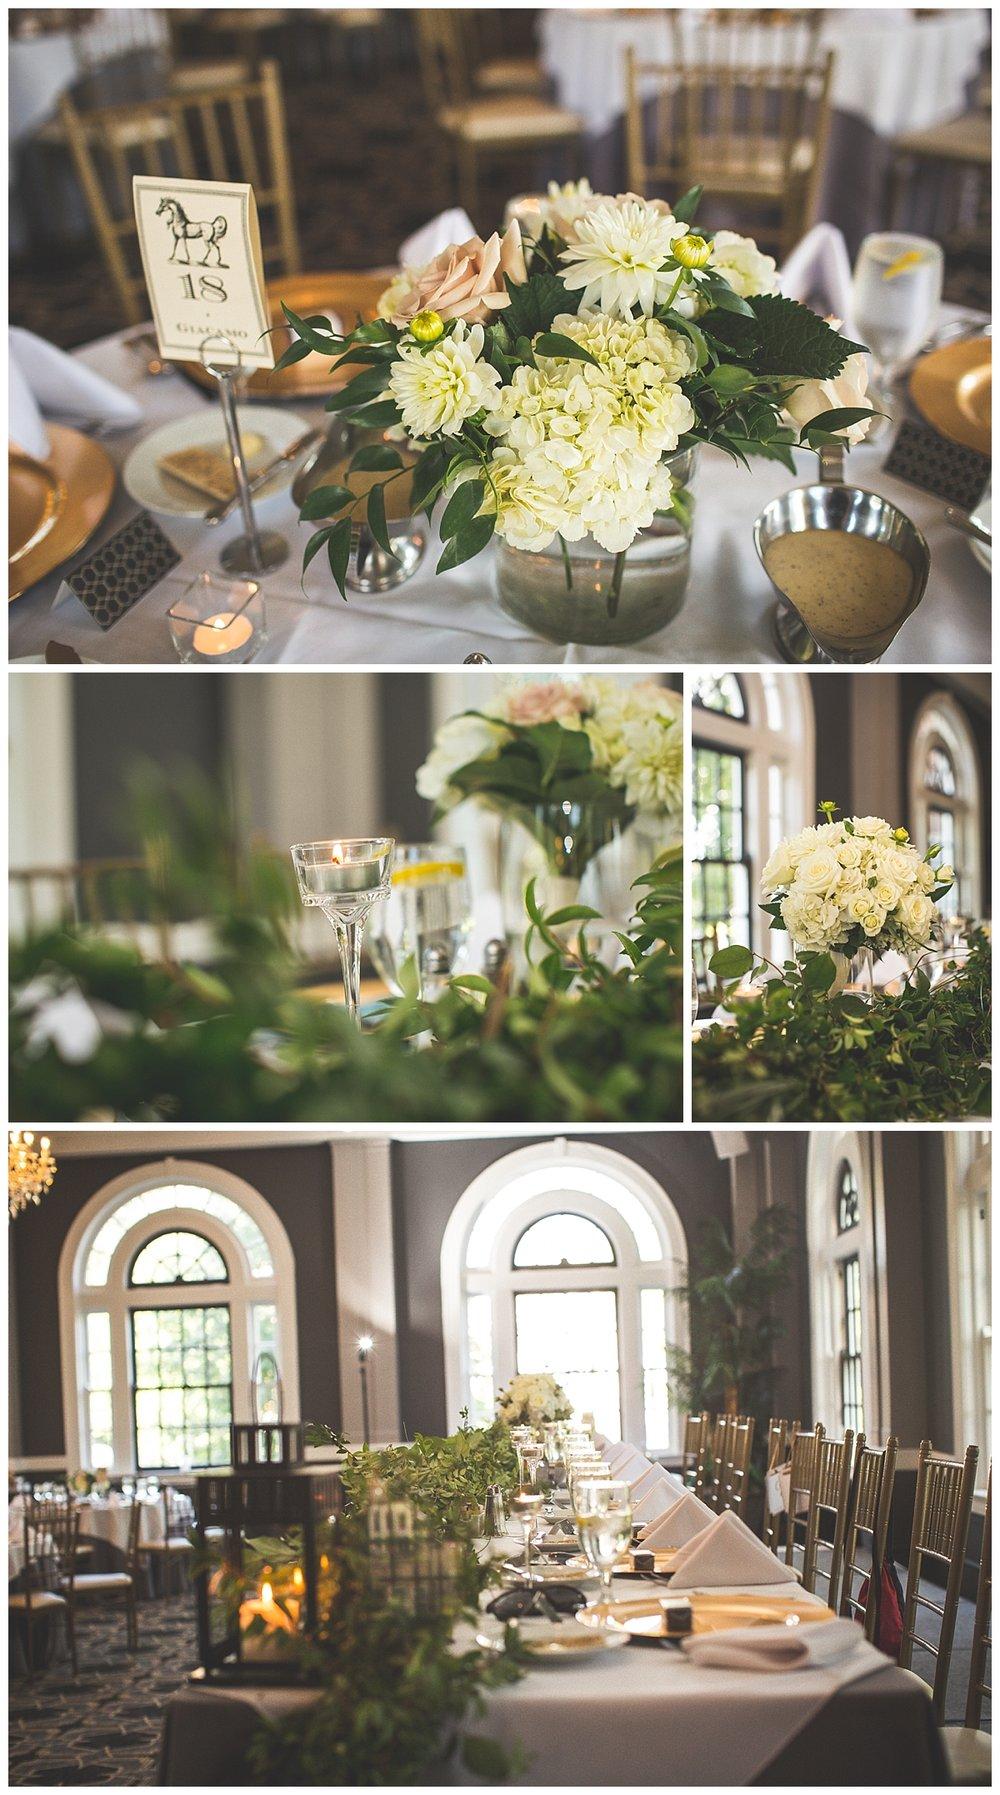 20180902-BridgetAdam-Wedding-blog-42.jpg